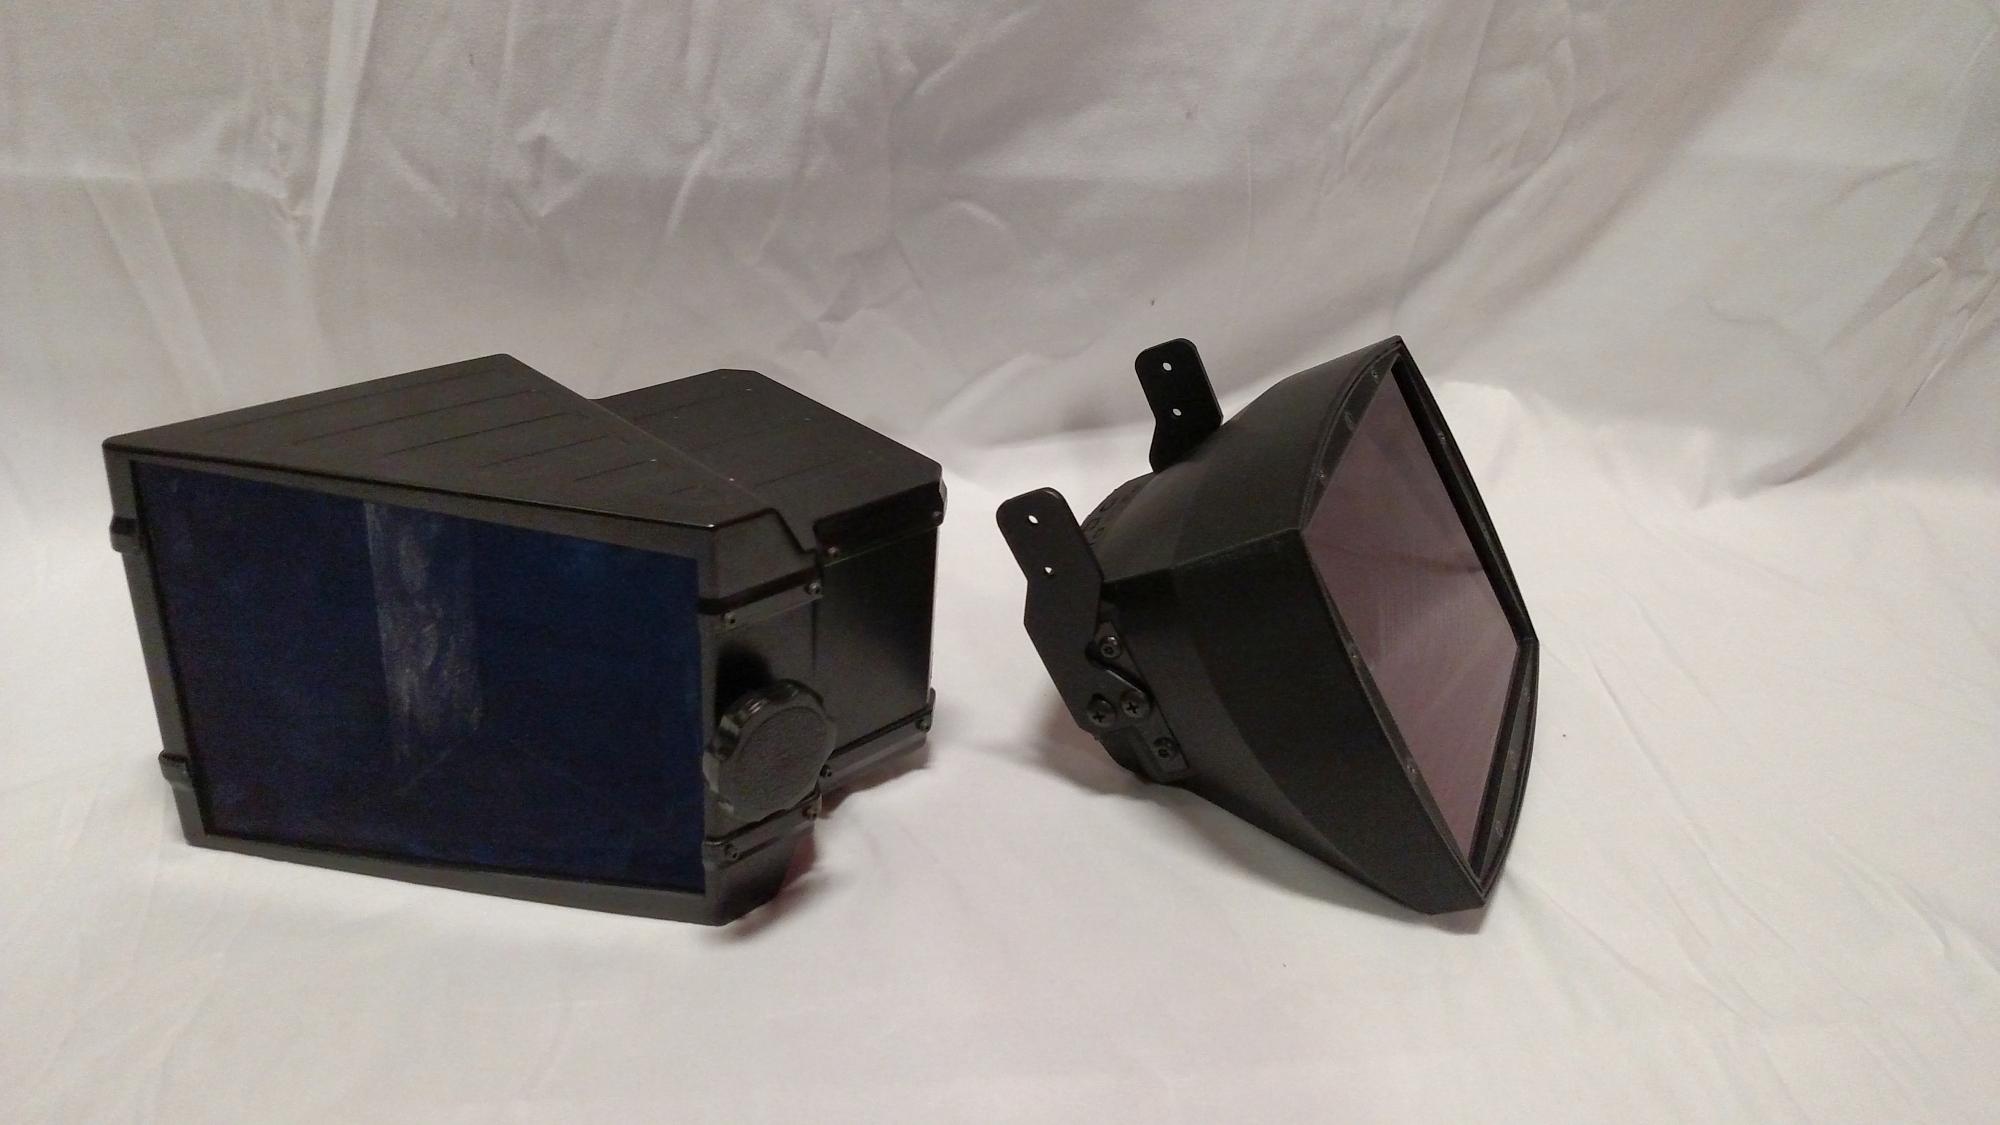 Panamorph UH480 vs. Paladin DCR Lenses